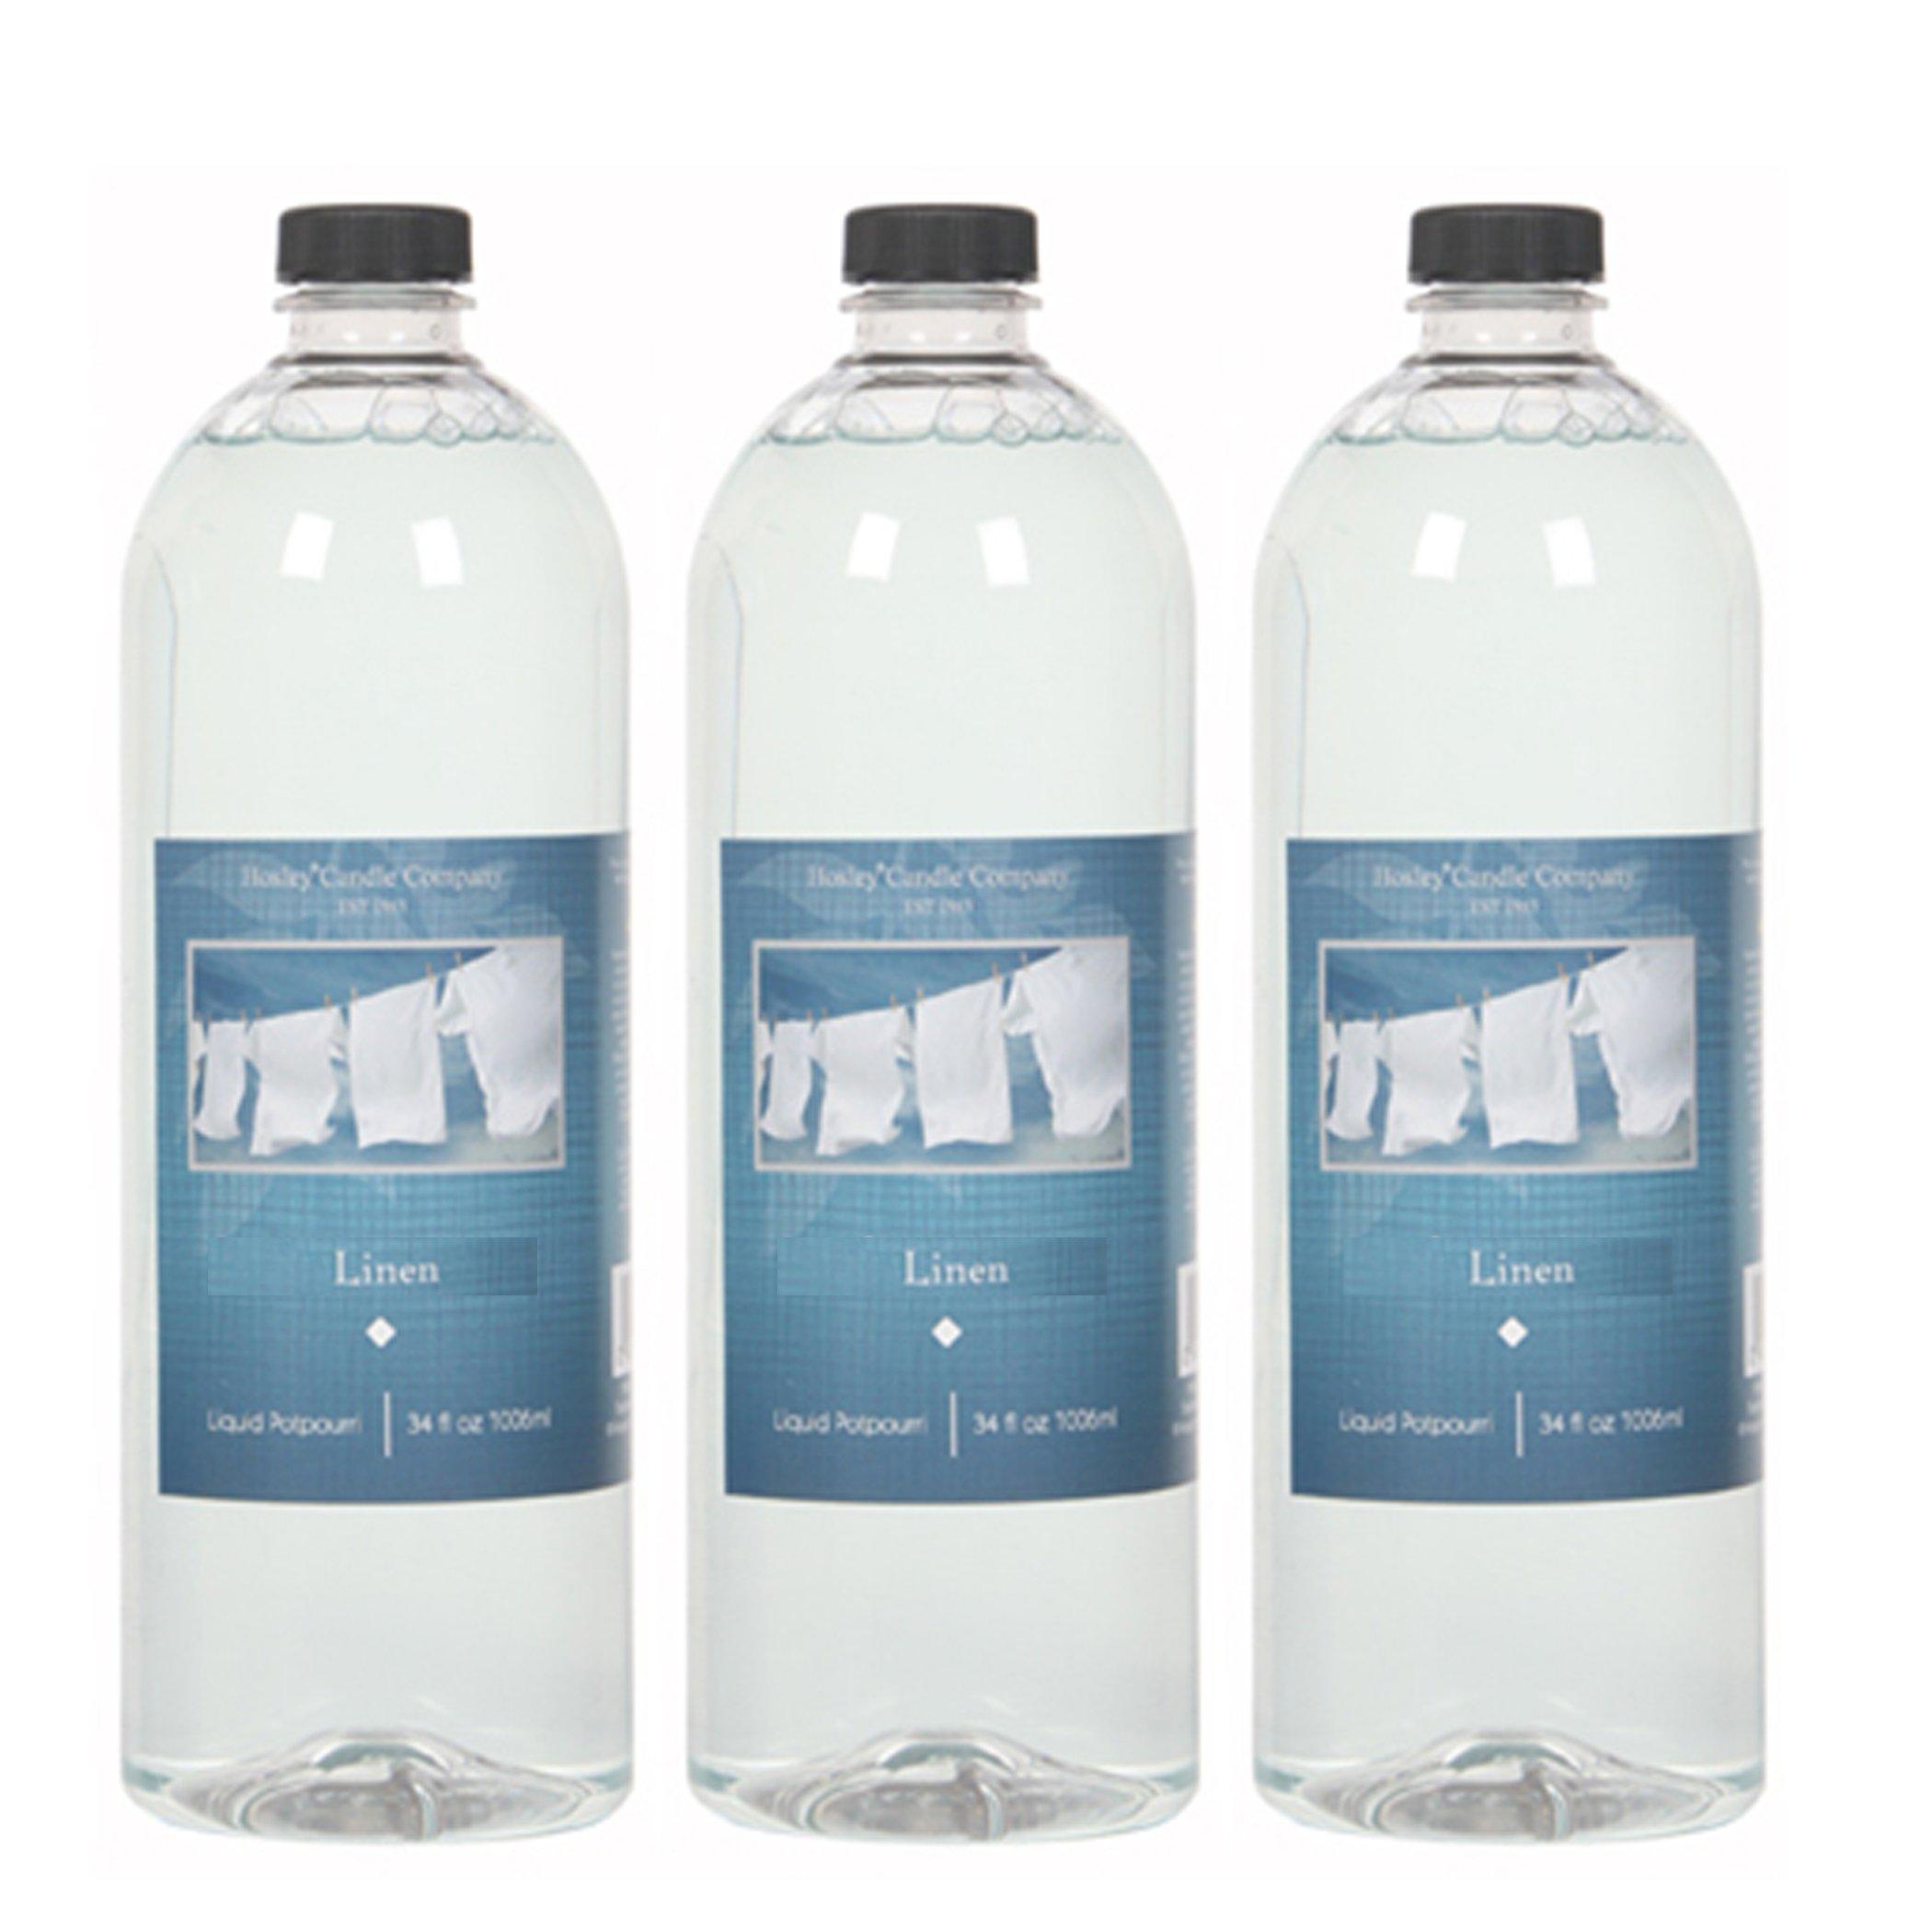 Hosley Premium Grade Candle Company Linen Liquid Potpourri for Aromatherapy, 34 oz, Case of 3